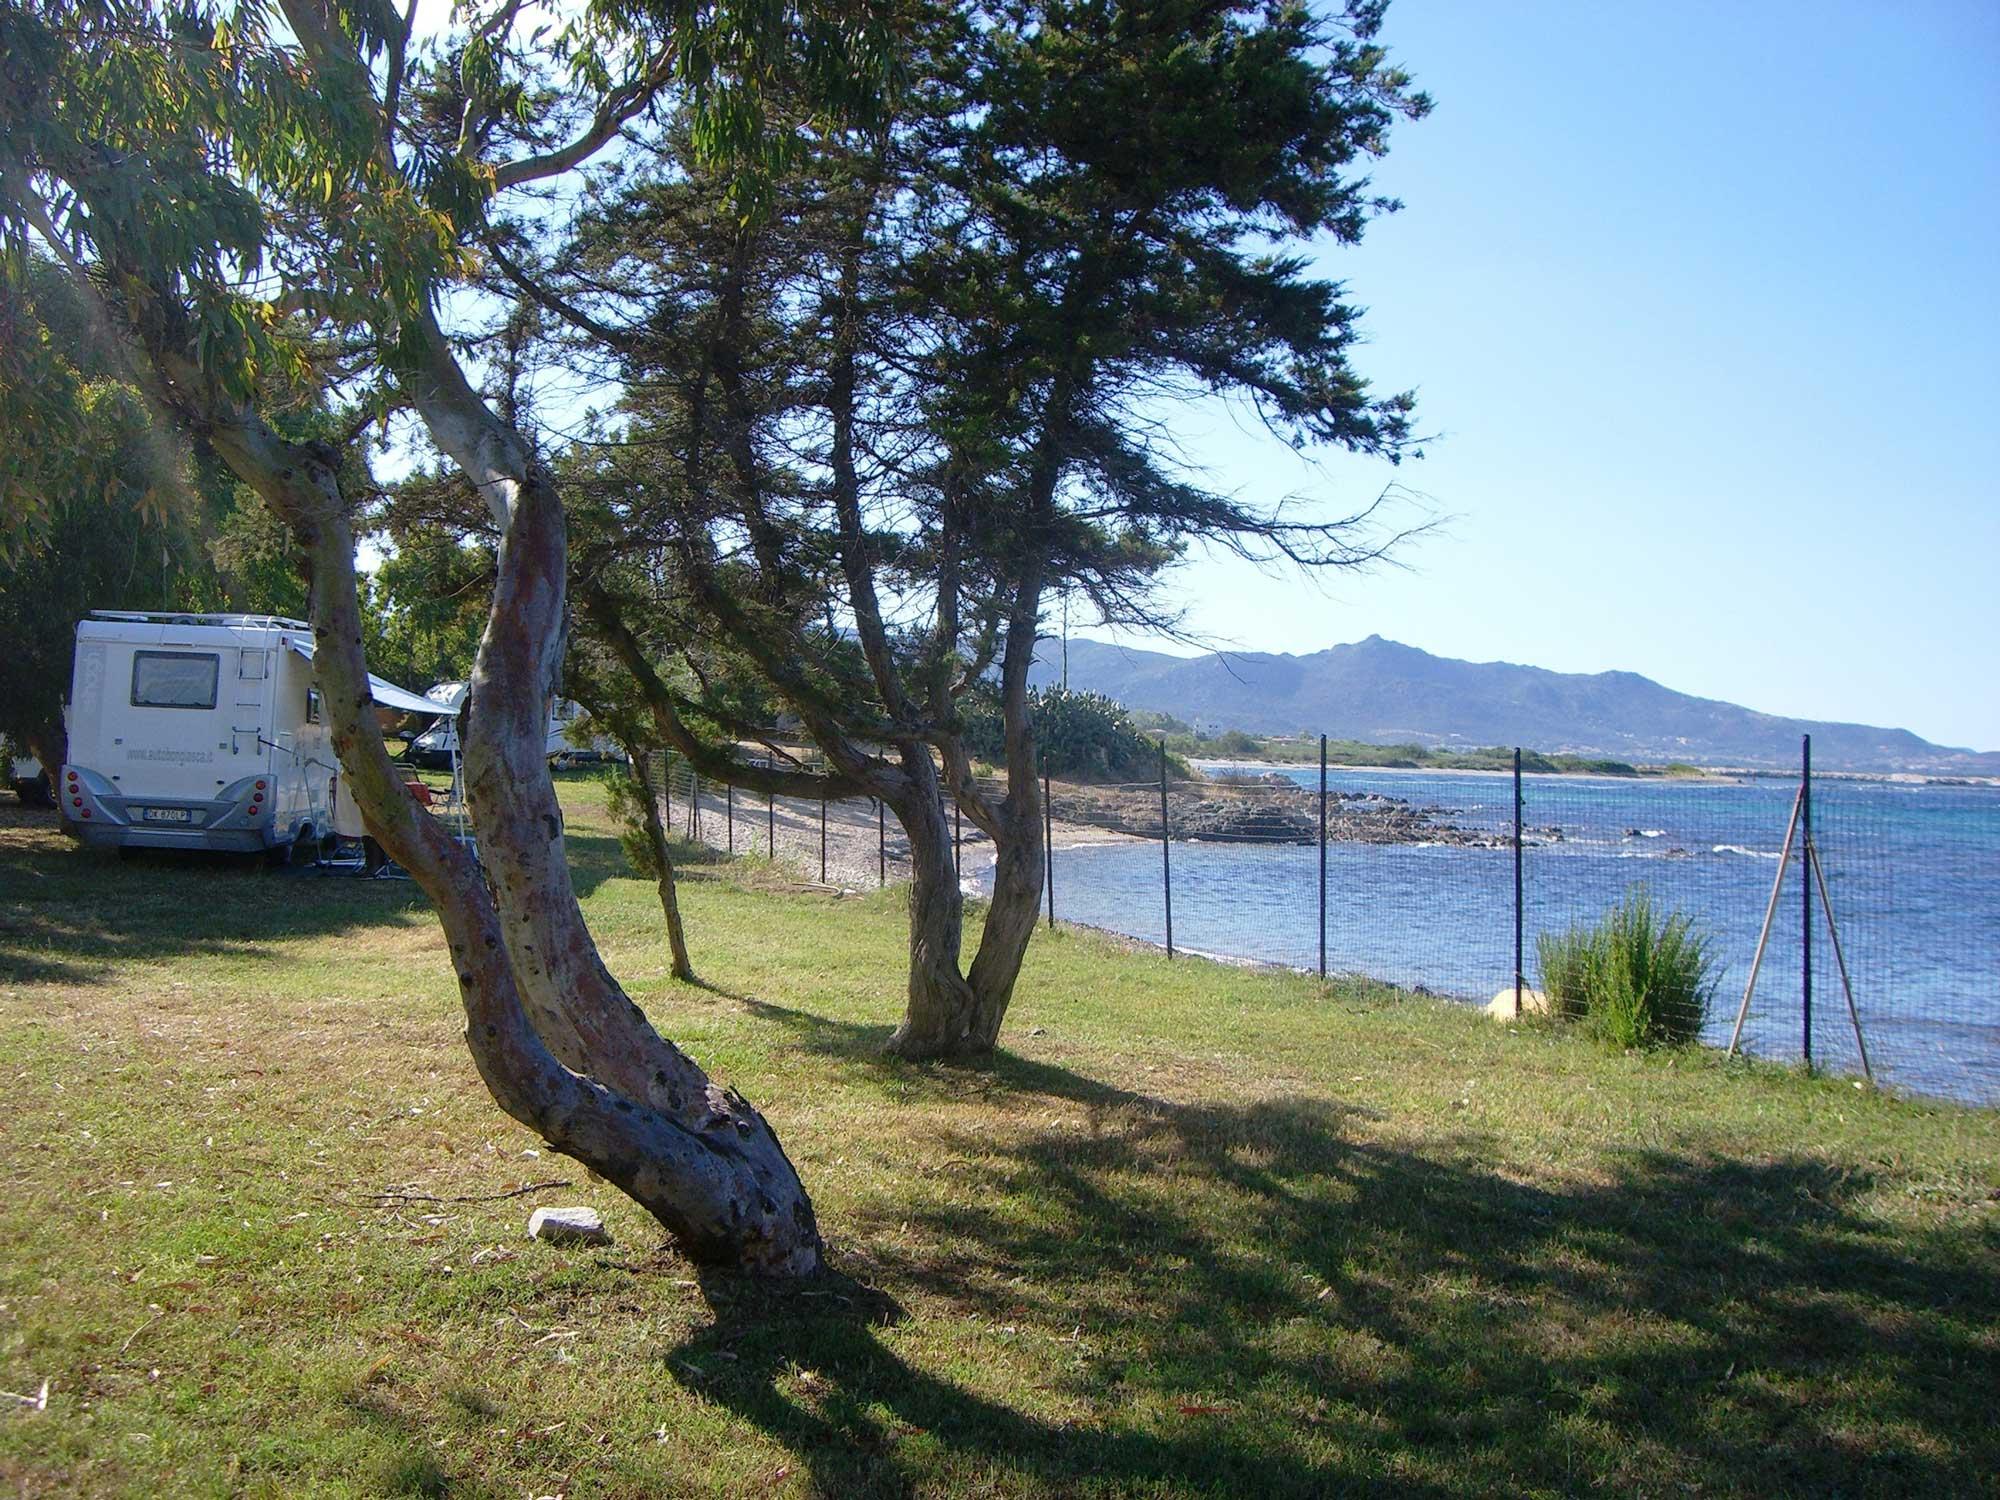 Campingplatz sardinien san teodoro camping am meer san for Sardinien campingplatze